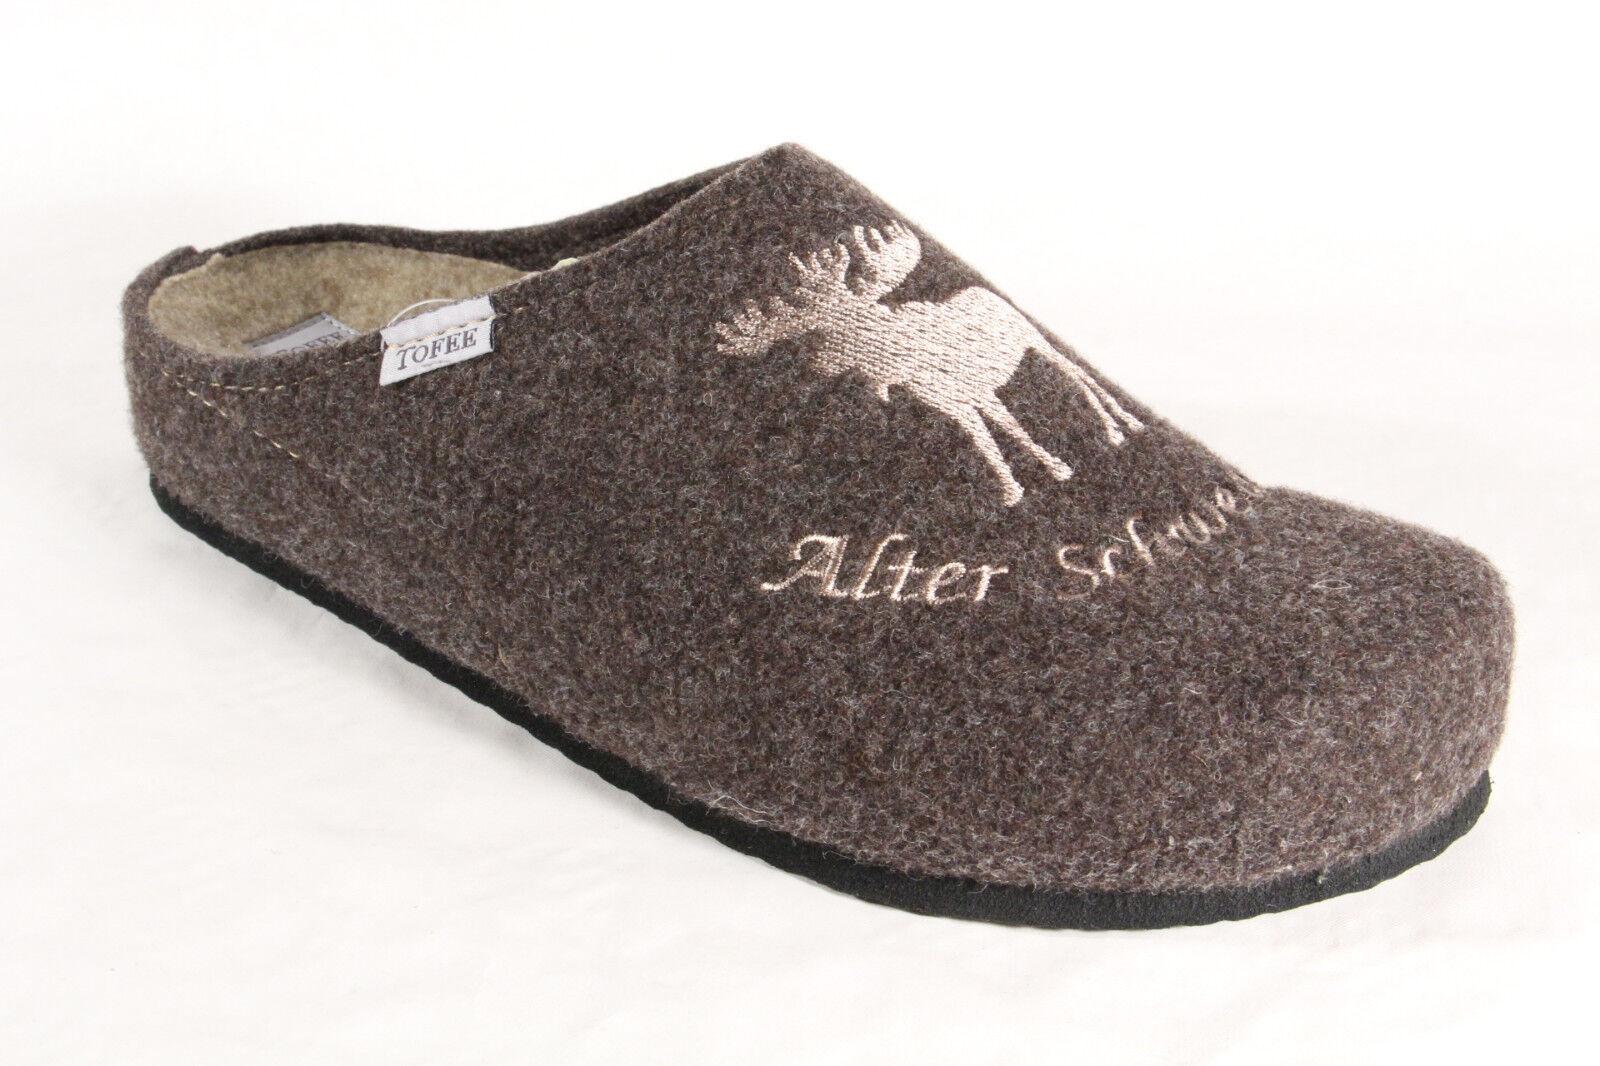 Pantofole da uomo TOFEE uomo pantofola ZOCCOLI SABOT MARRONE 74-181 NUOVO